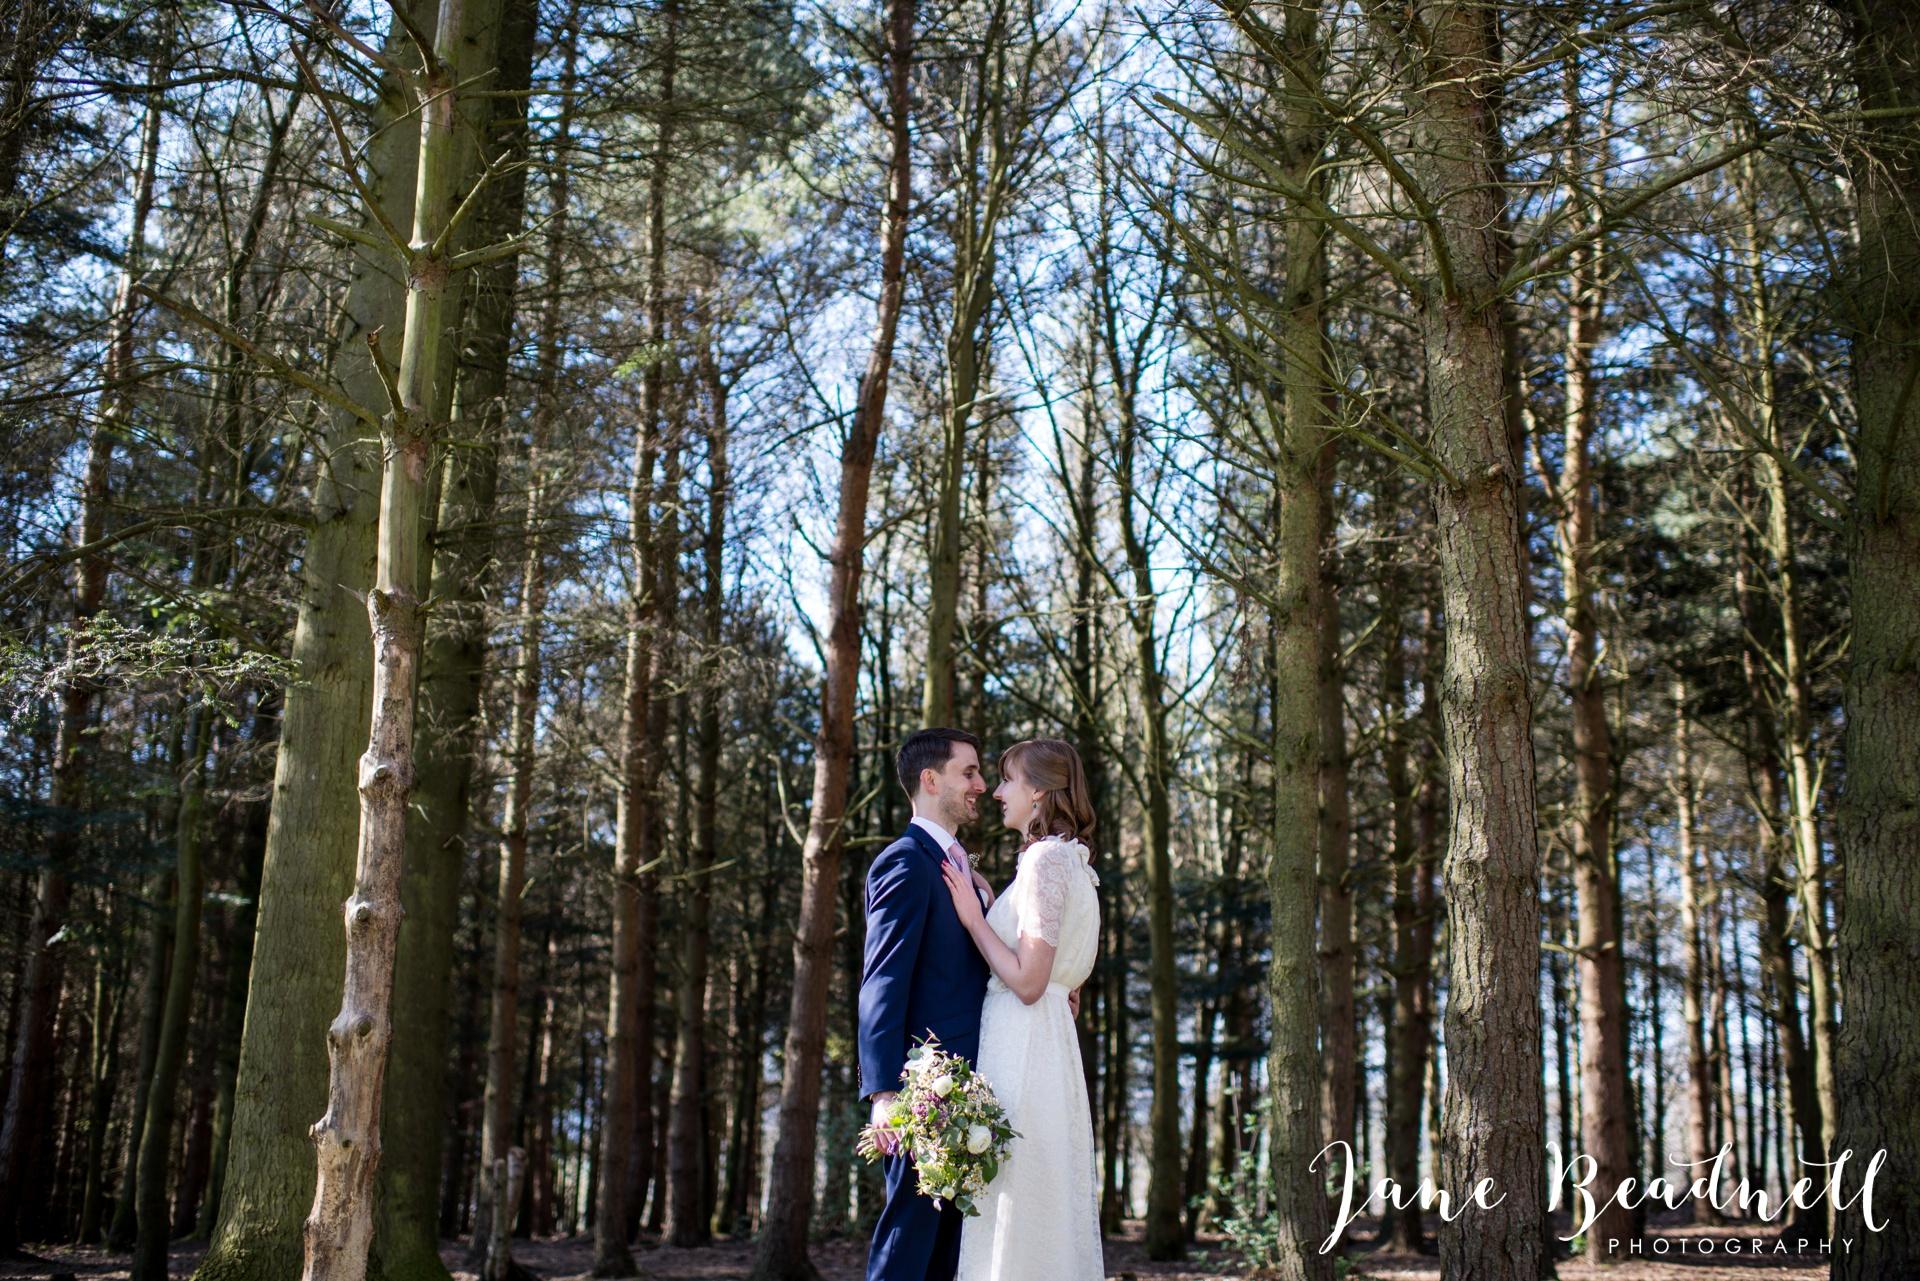 Jane Beadnell fine art wedding photographer The Cheerful Chilli Barn Otley_0032